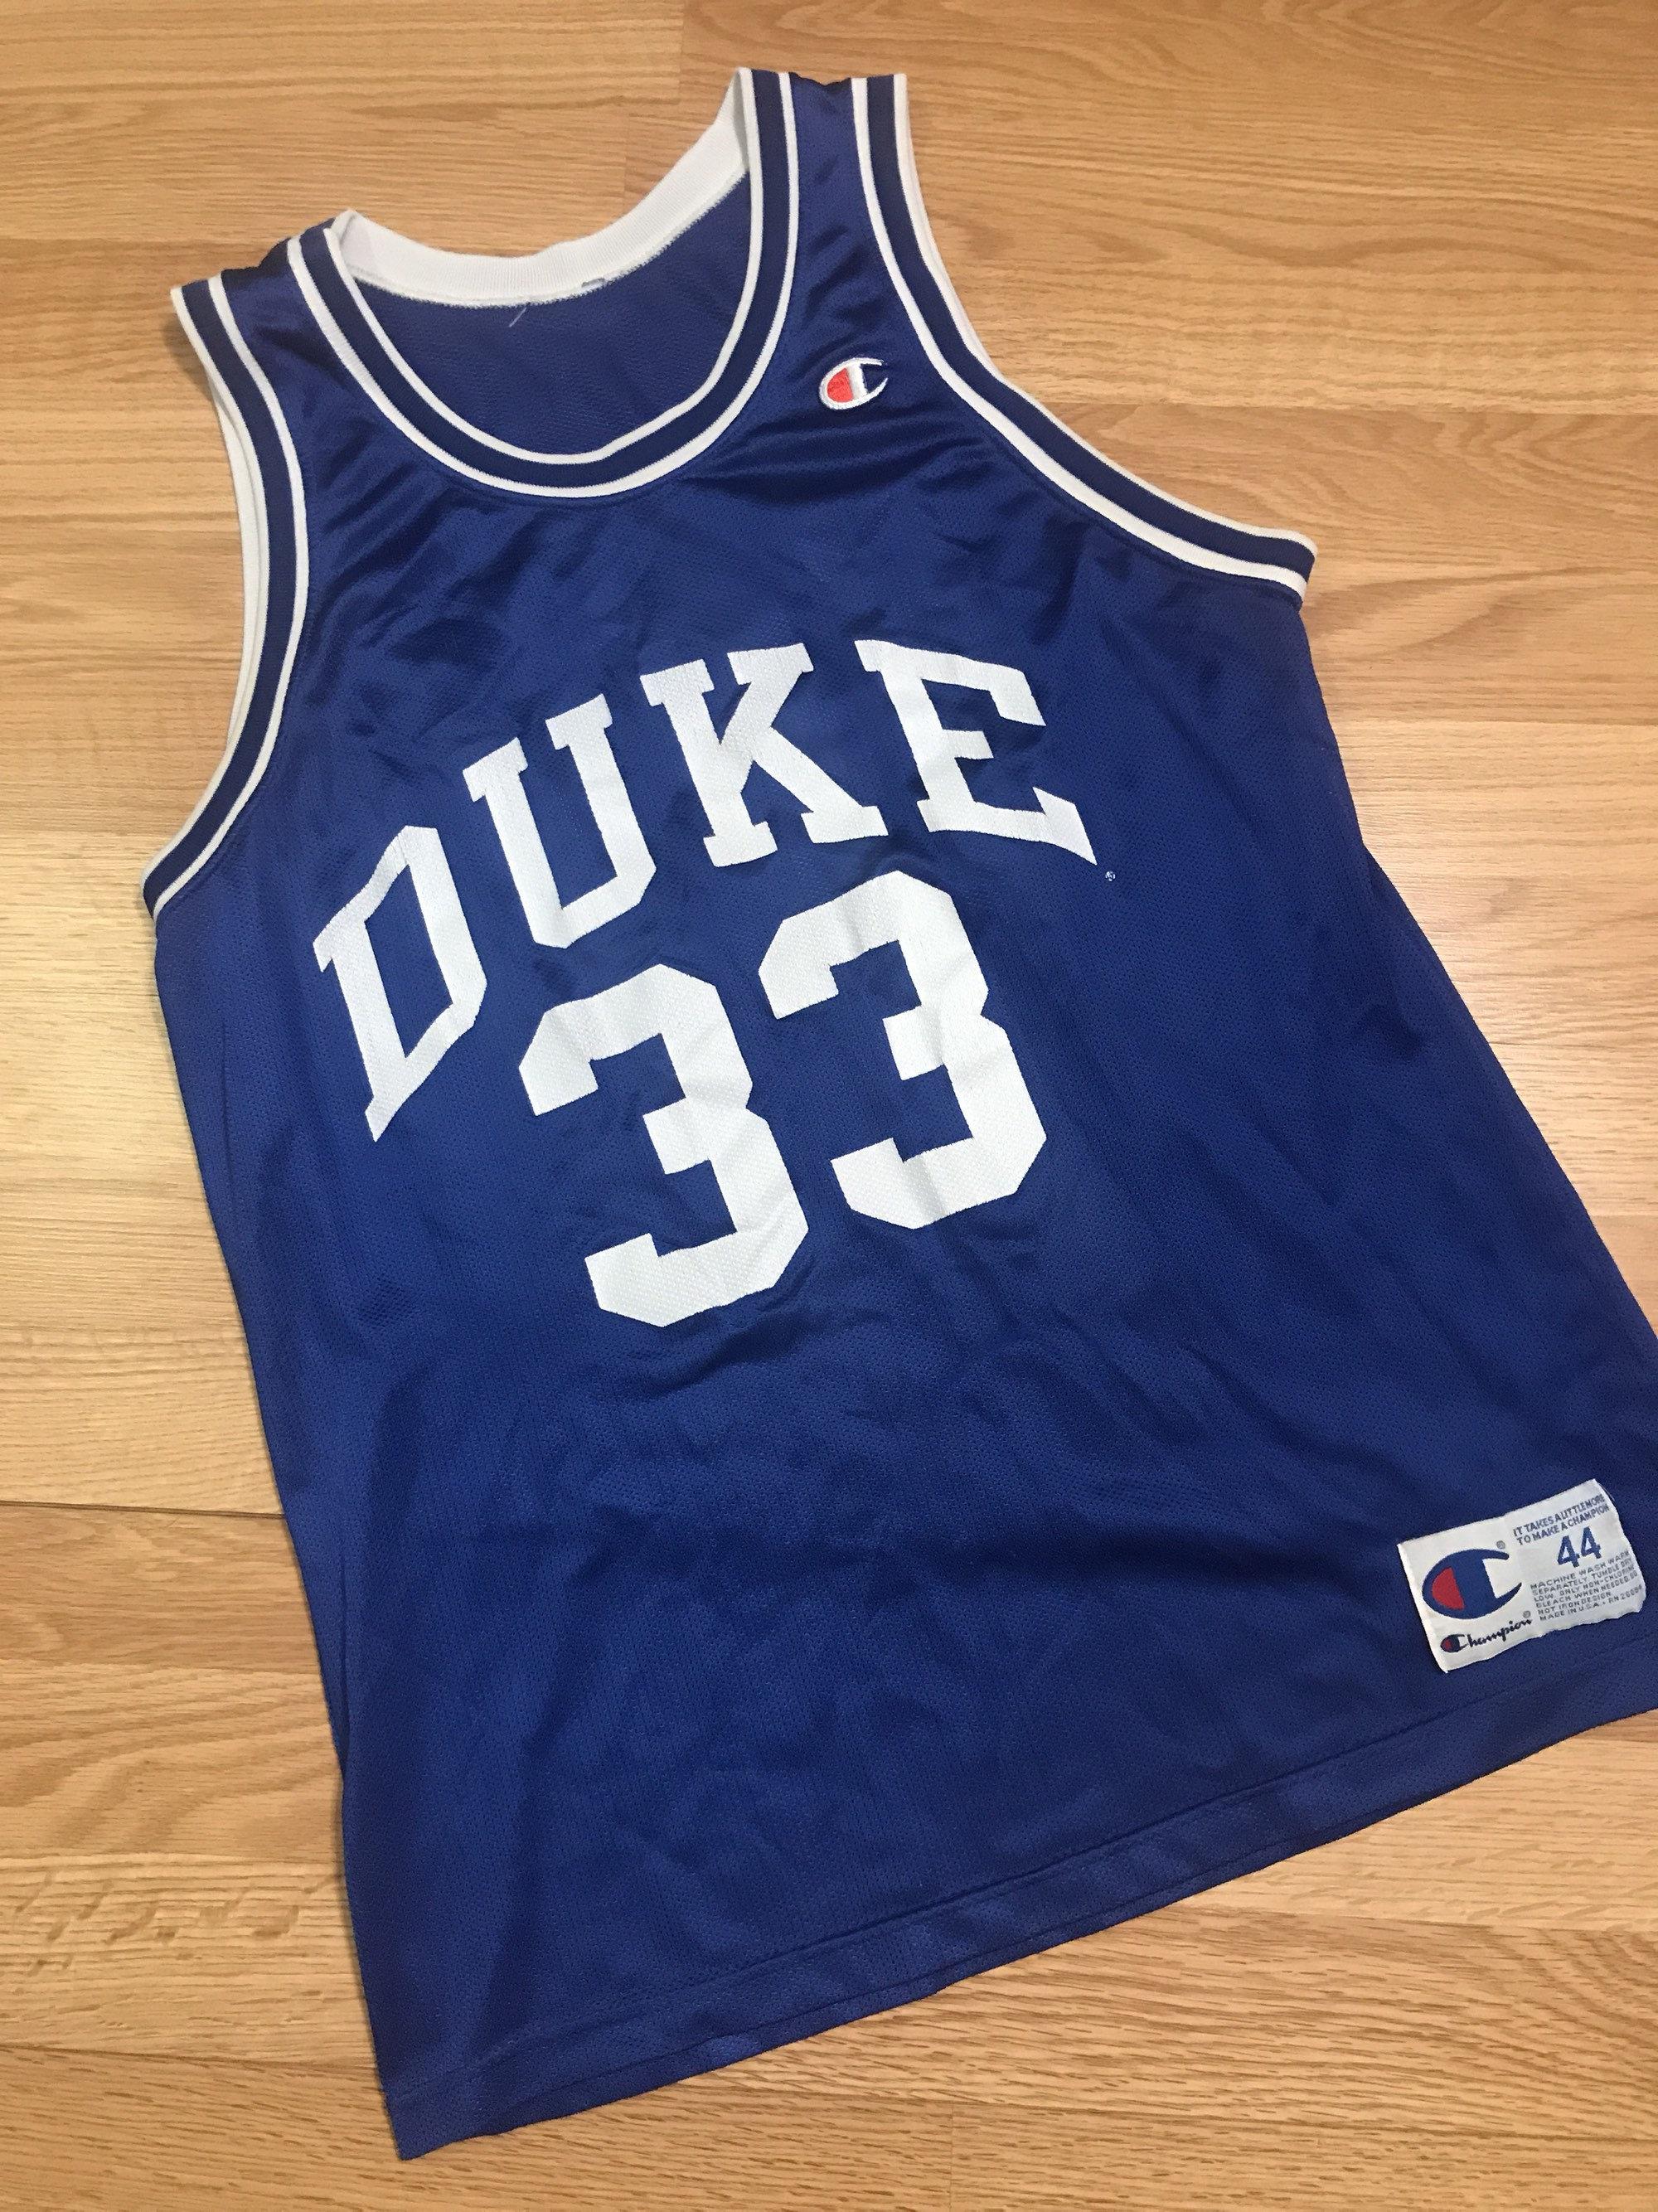 1b017298a20 Vintage grant hill duke jersey size large 44